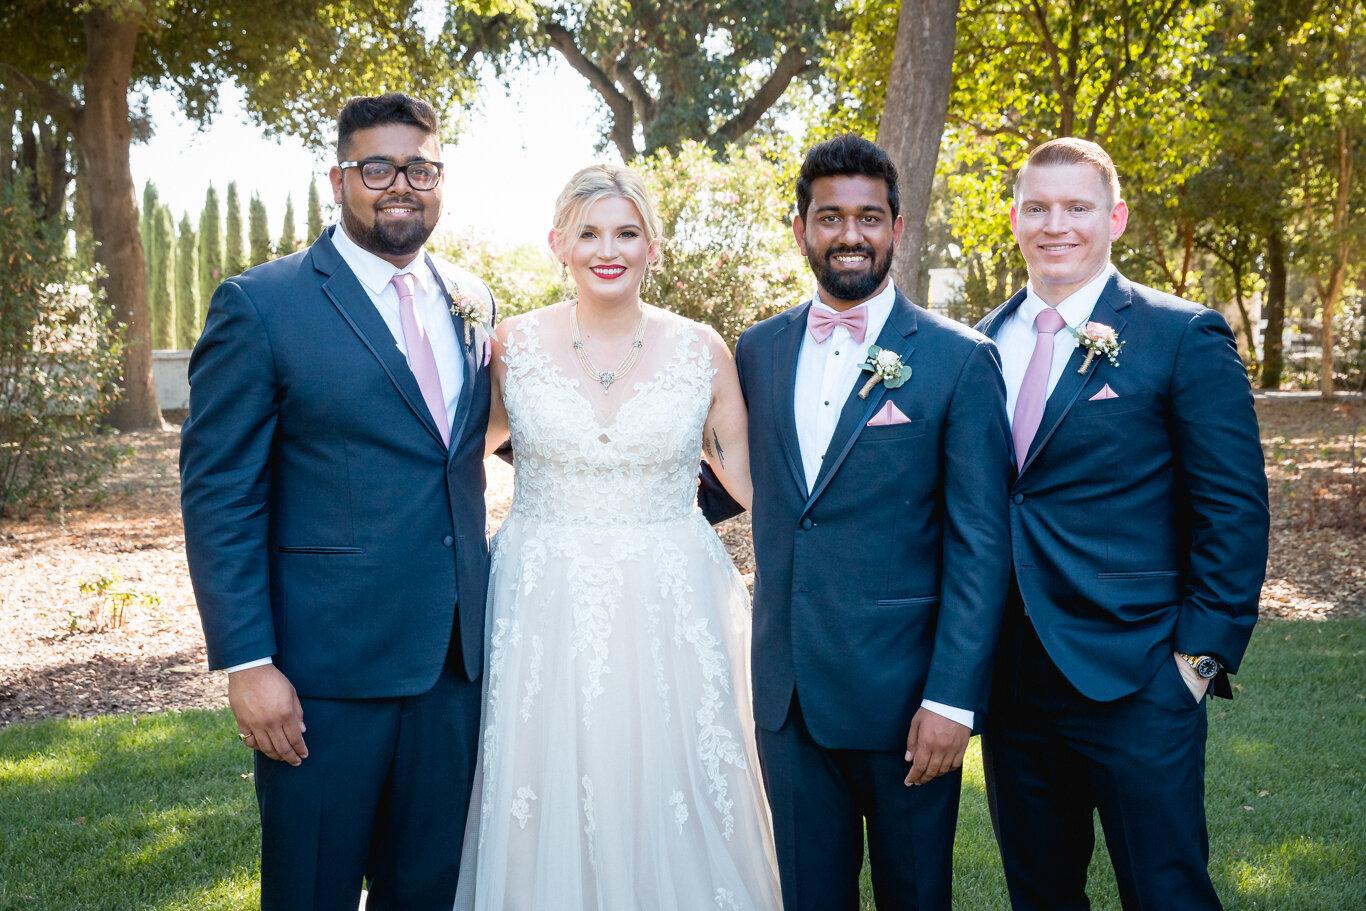 2019.08.24_Emily-Ashir-Wedding-at-the-Maples-5525.jpg